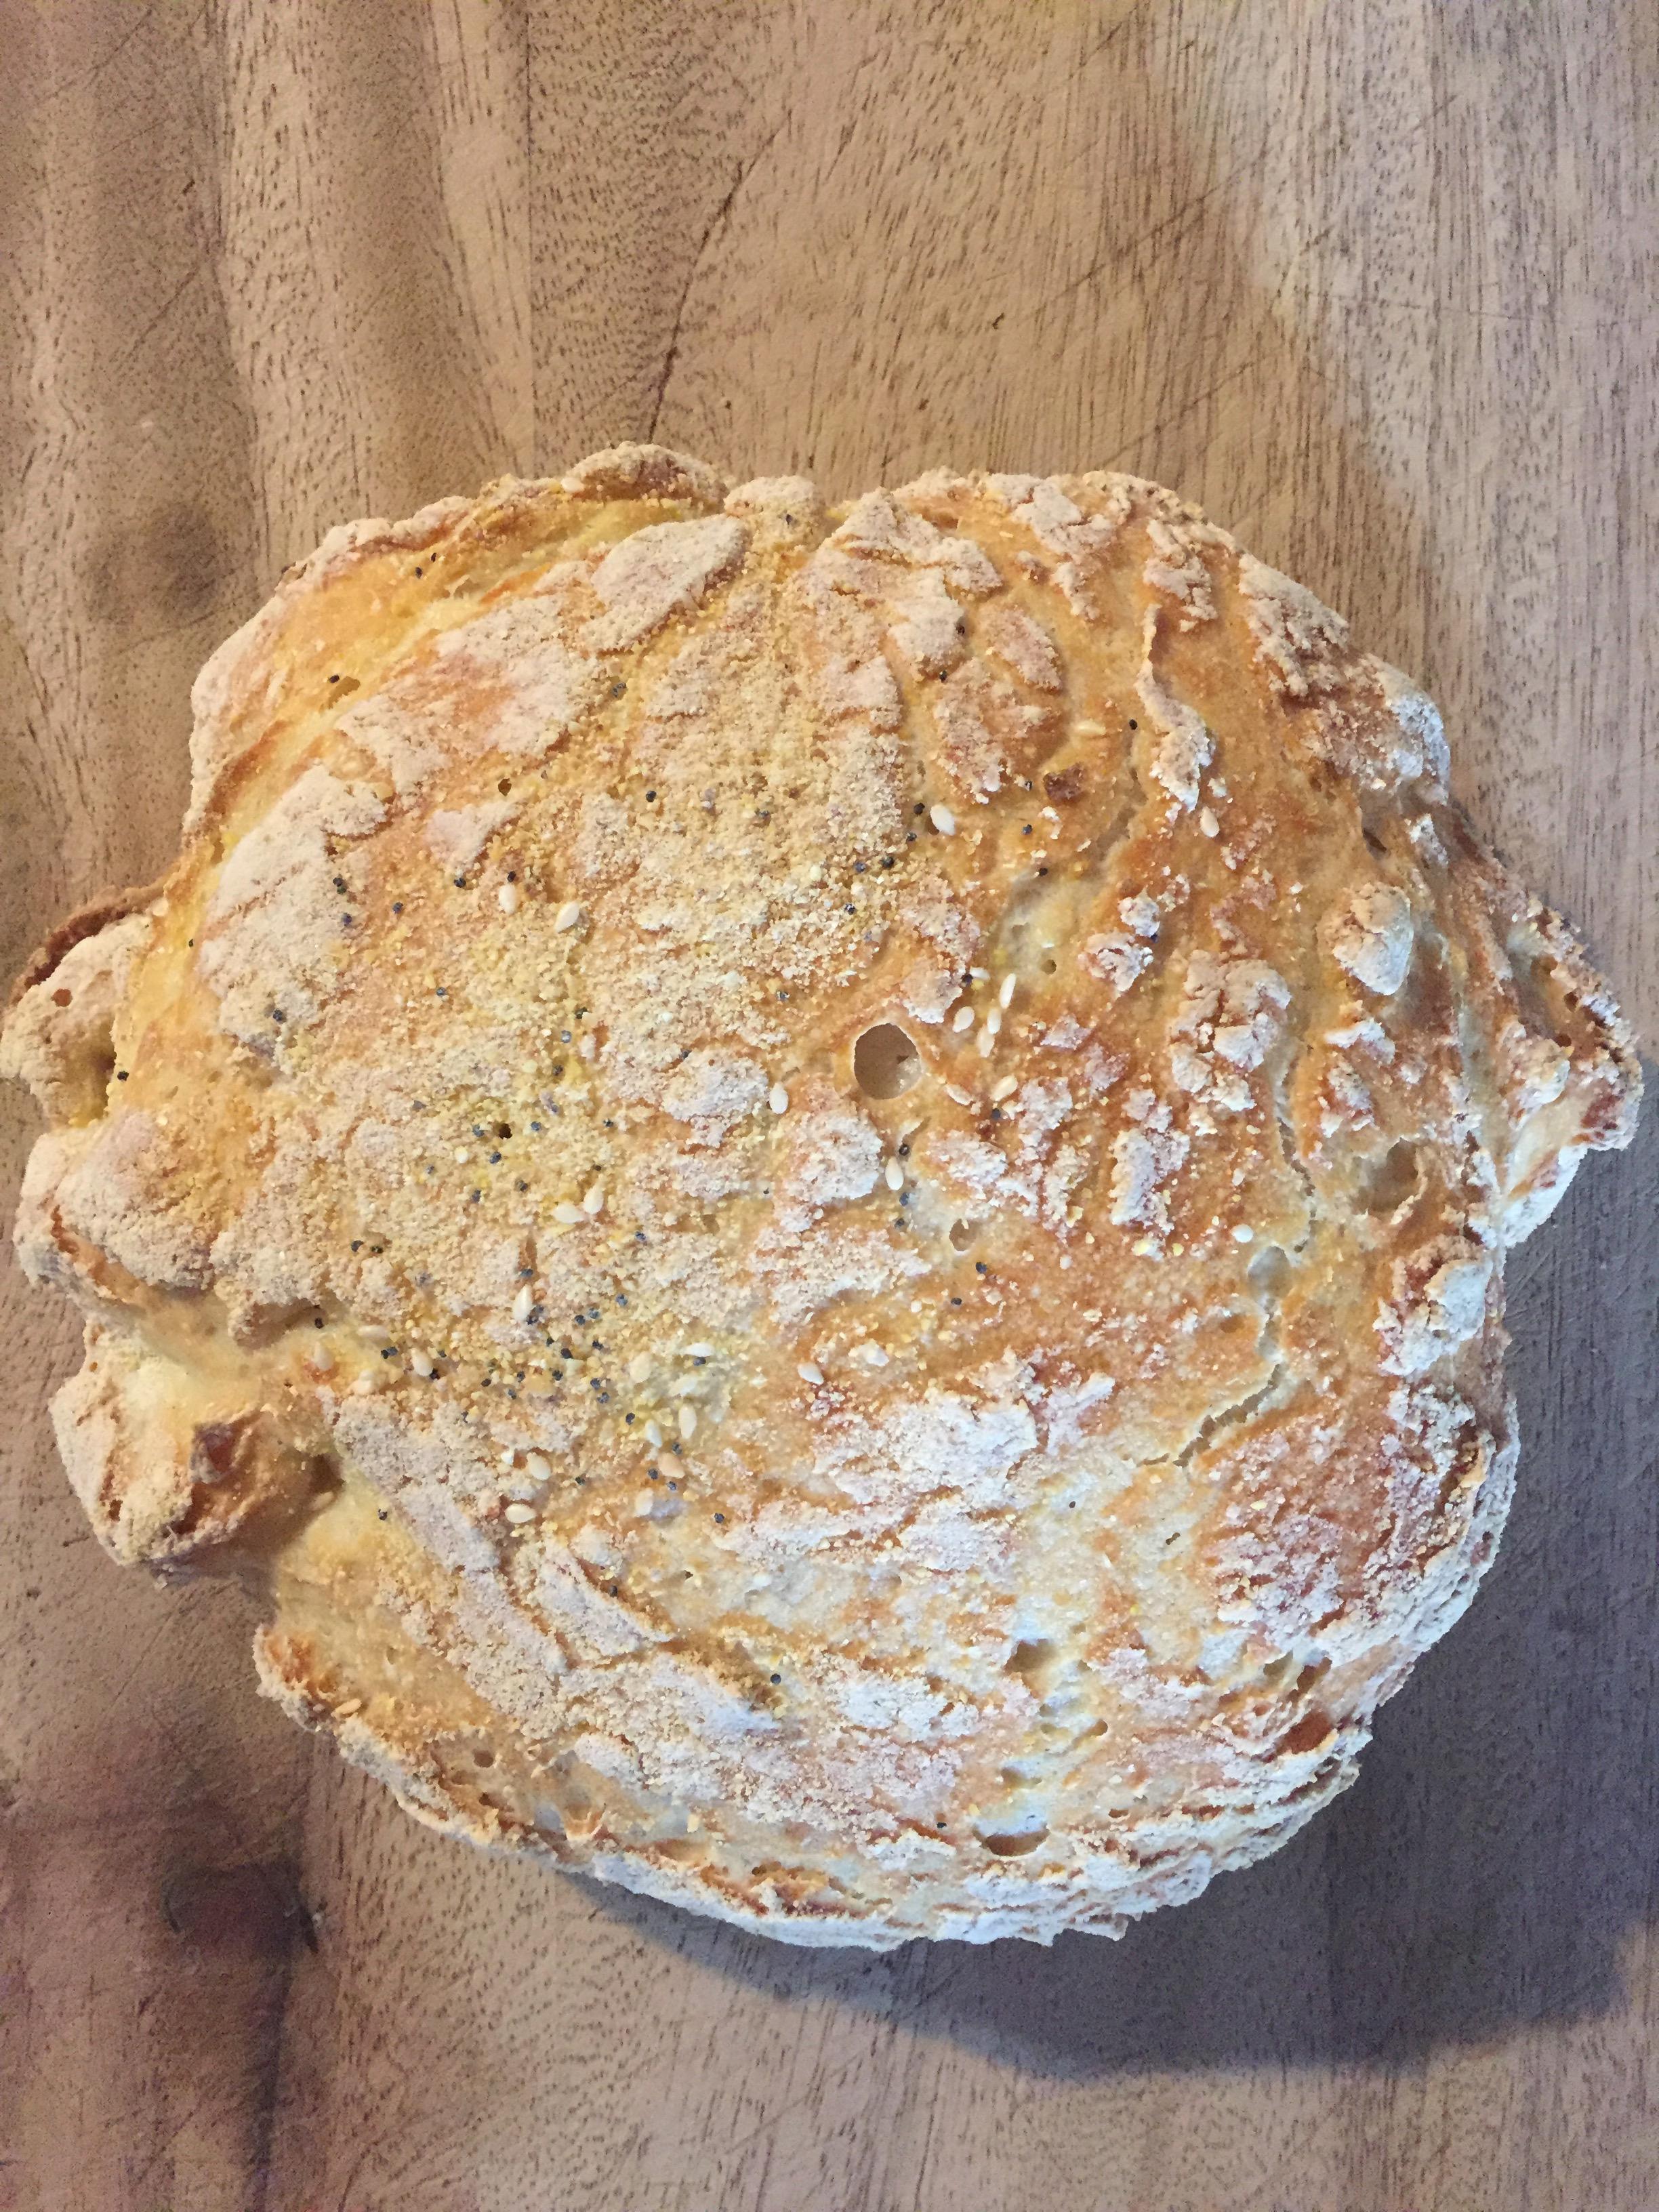 Gluten-Free, Vegan, No Knead Bread Baked in a Dutch Oven